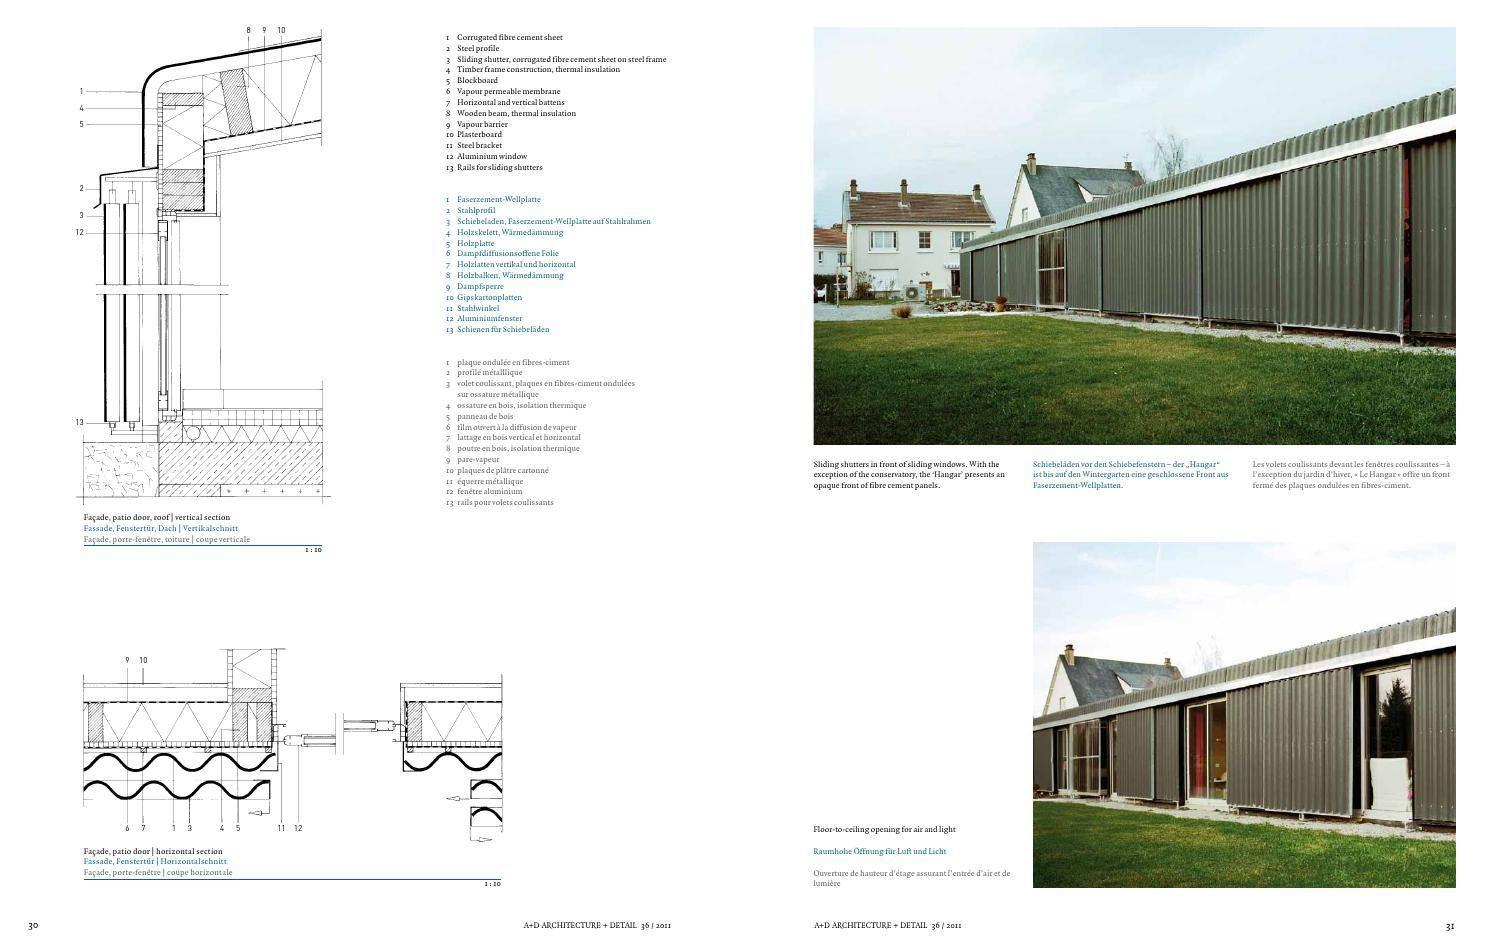 Architecture & Detail Magazine Issue 36 Architecture